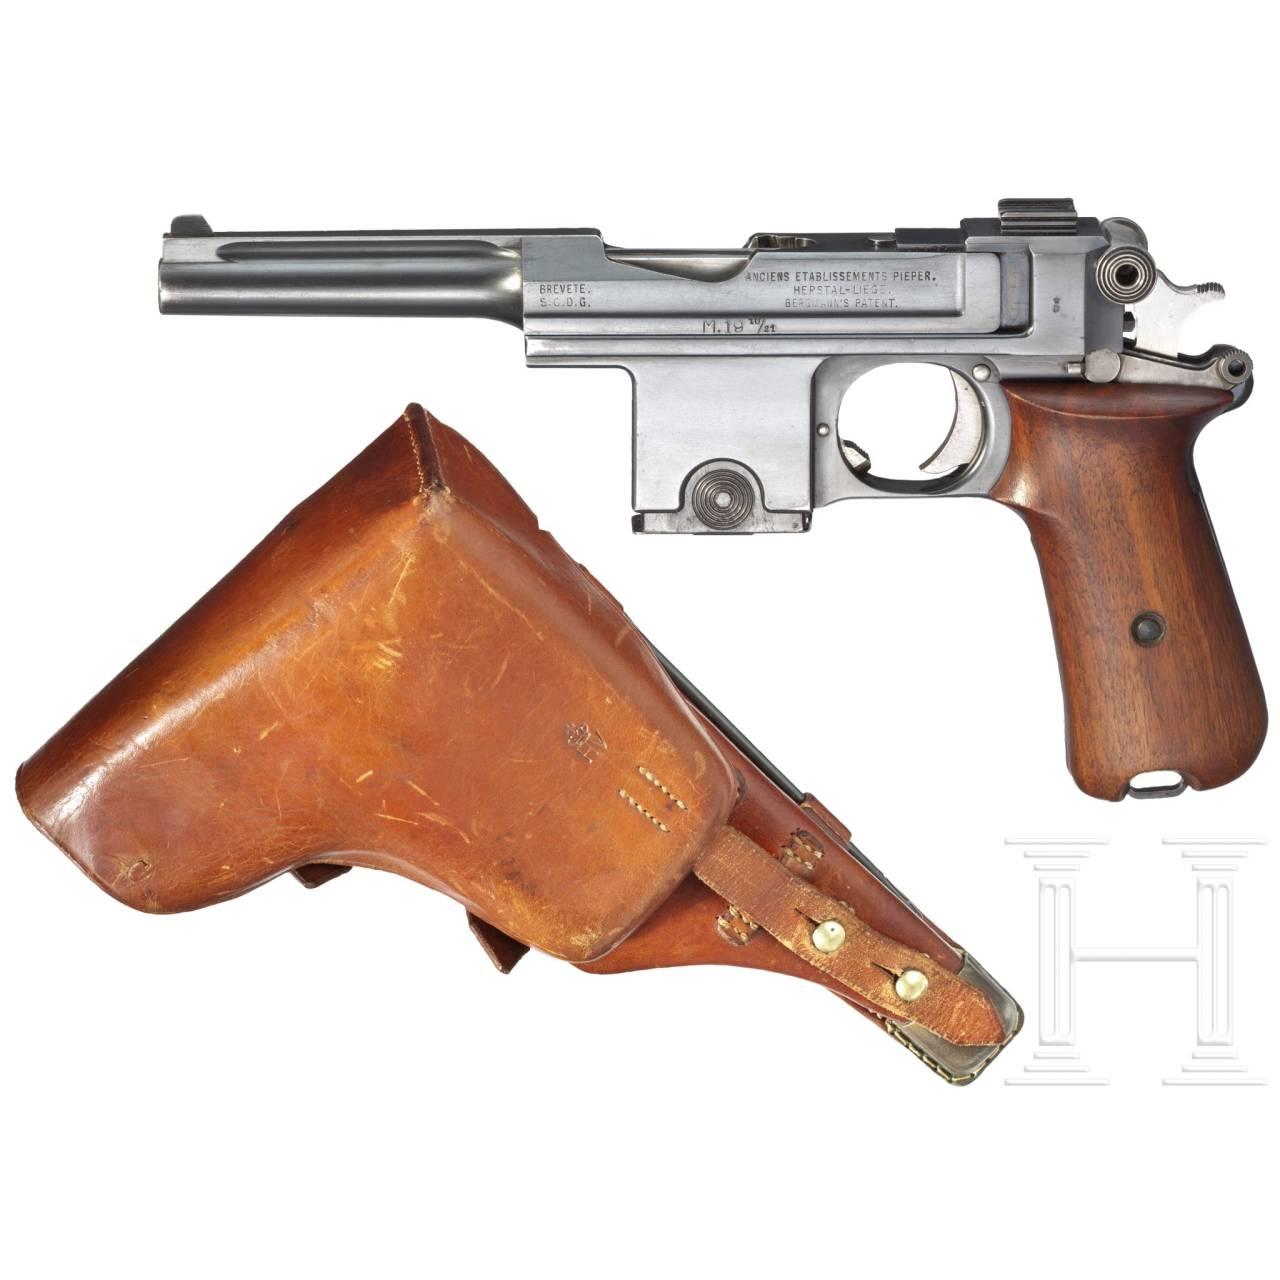 A Bergmann M1910/21, with hard-shell holster